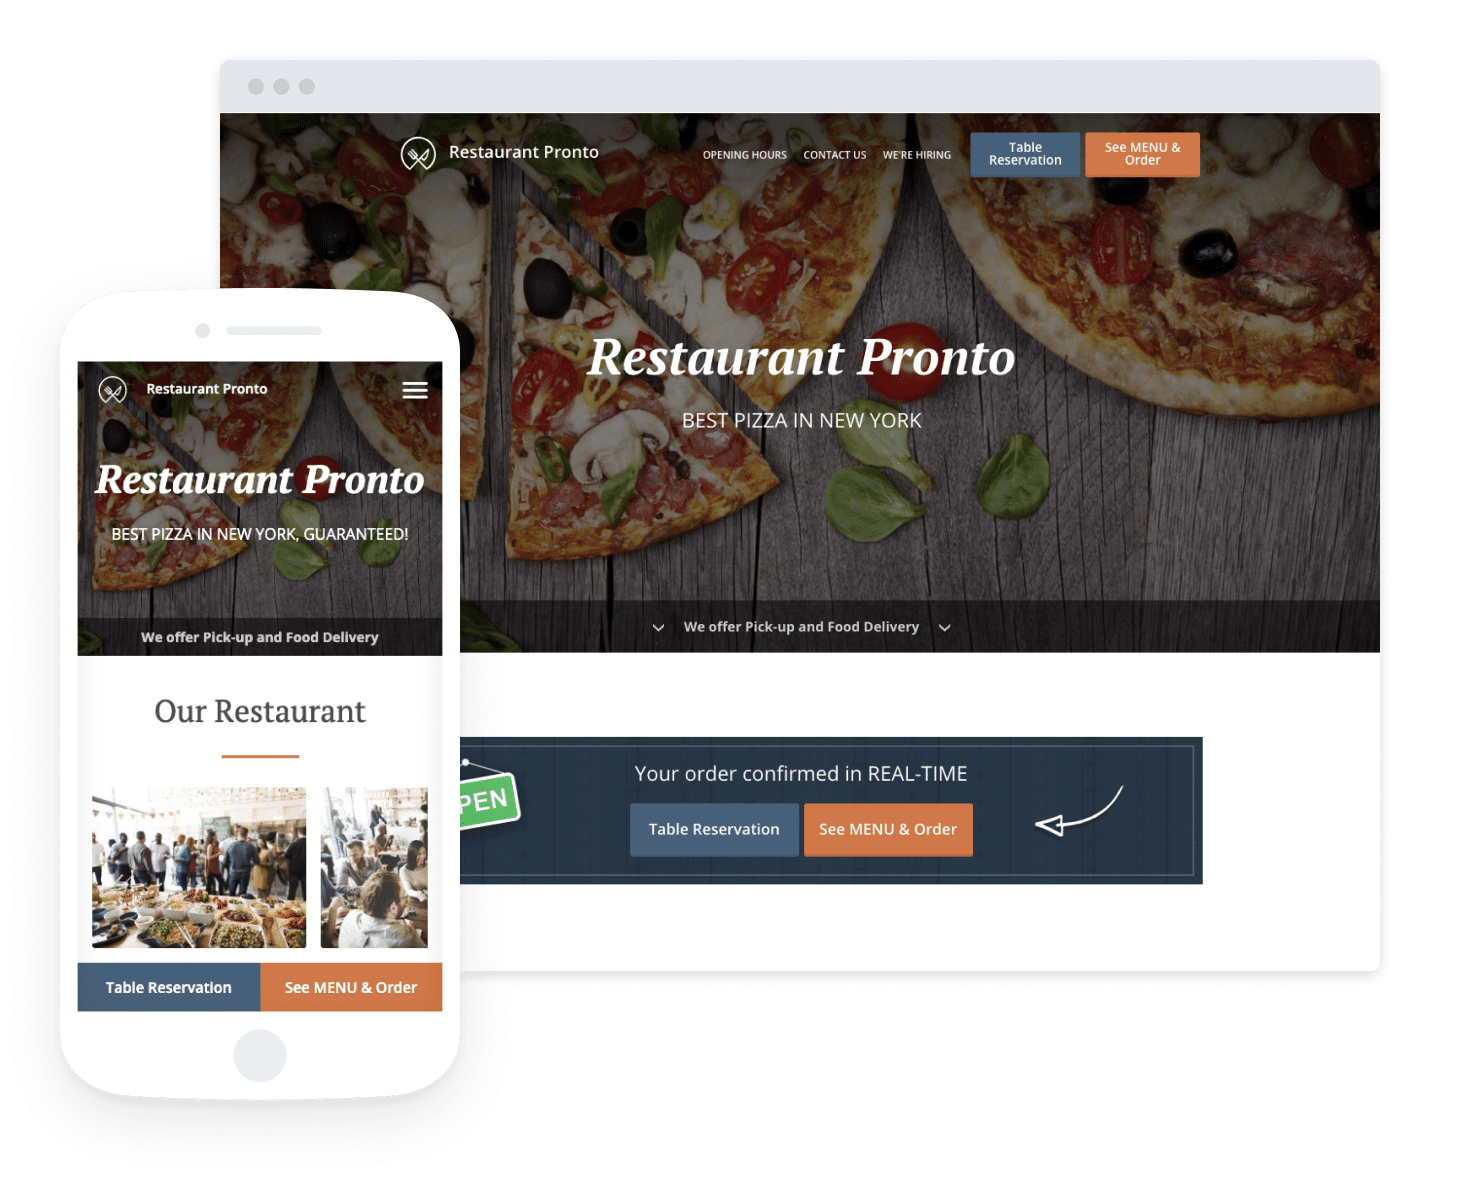 see menu and order